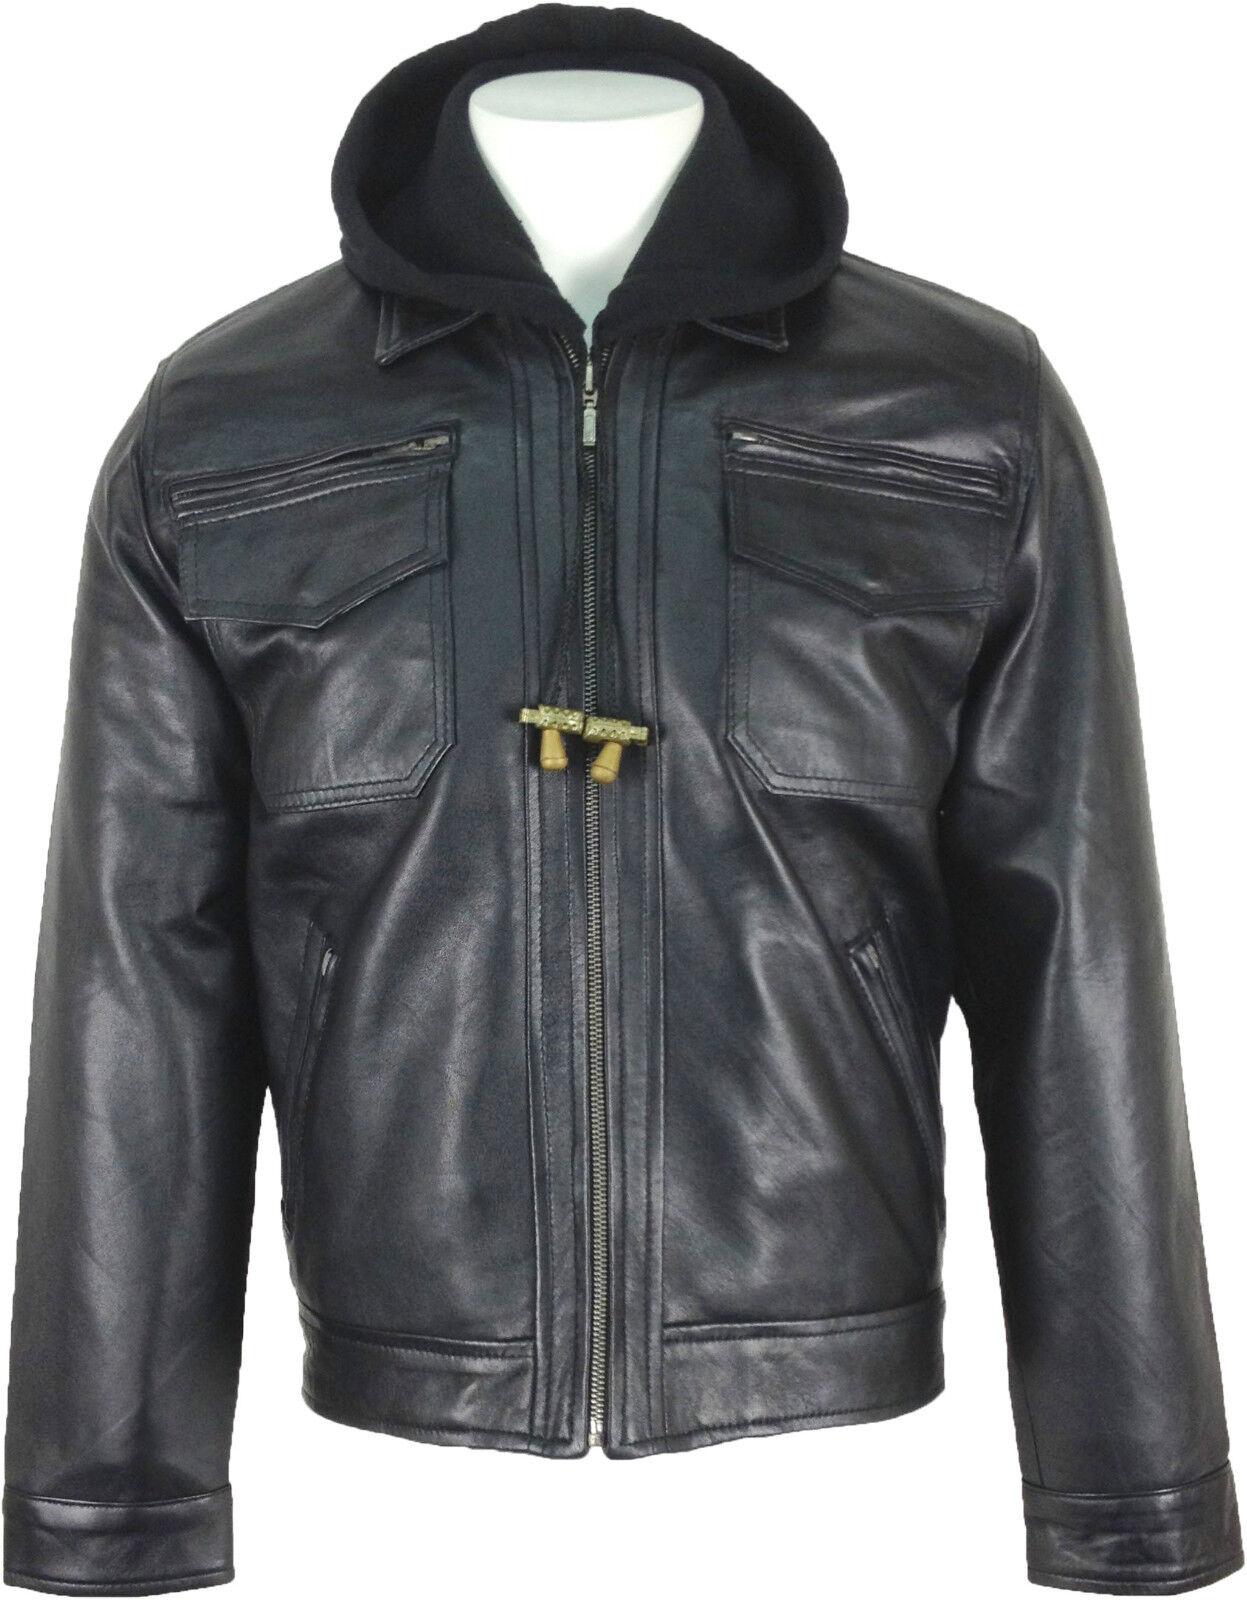 UNICORN Hombres Moda Encapuchado Genuino real cuero chaqueta Negro  K4